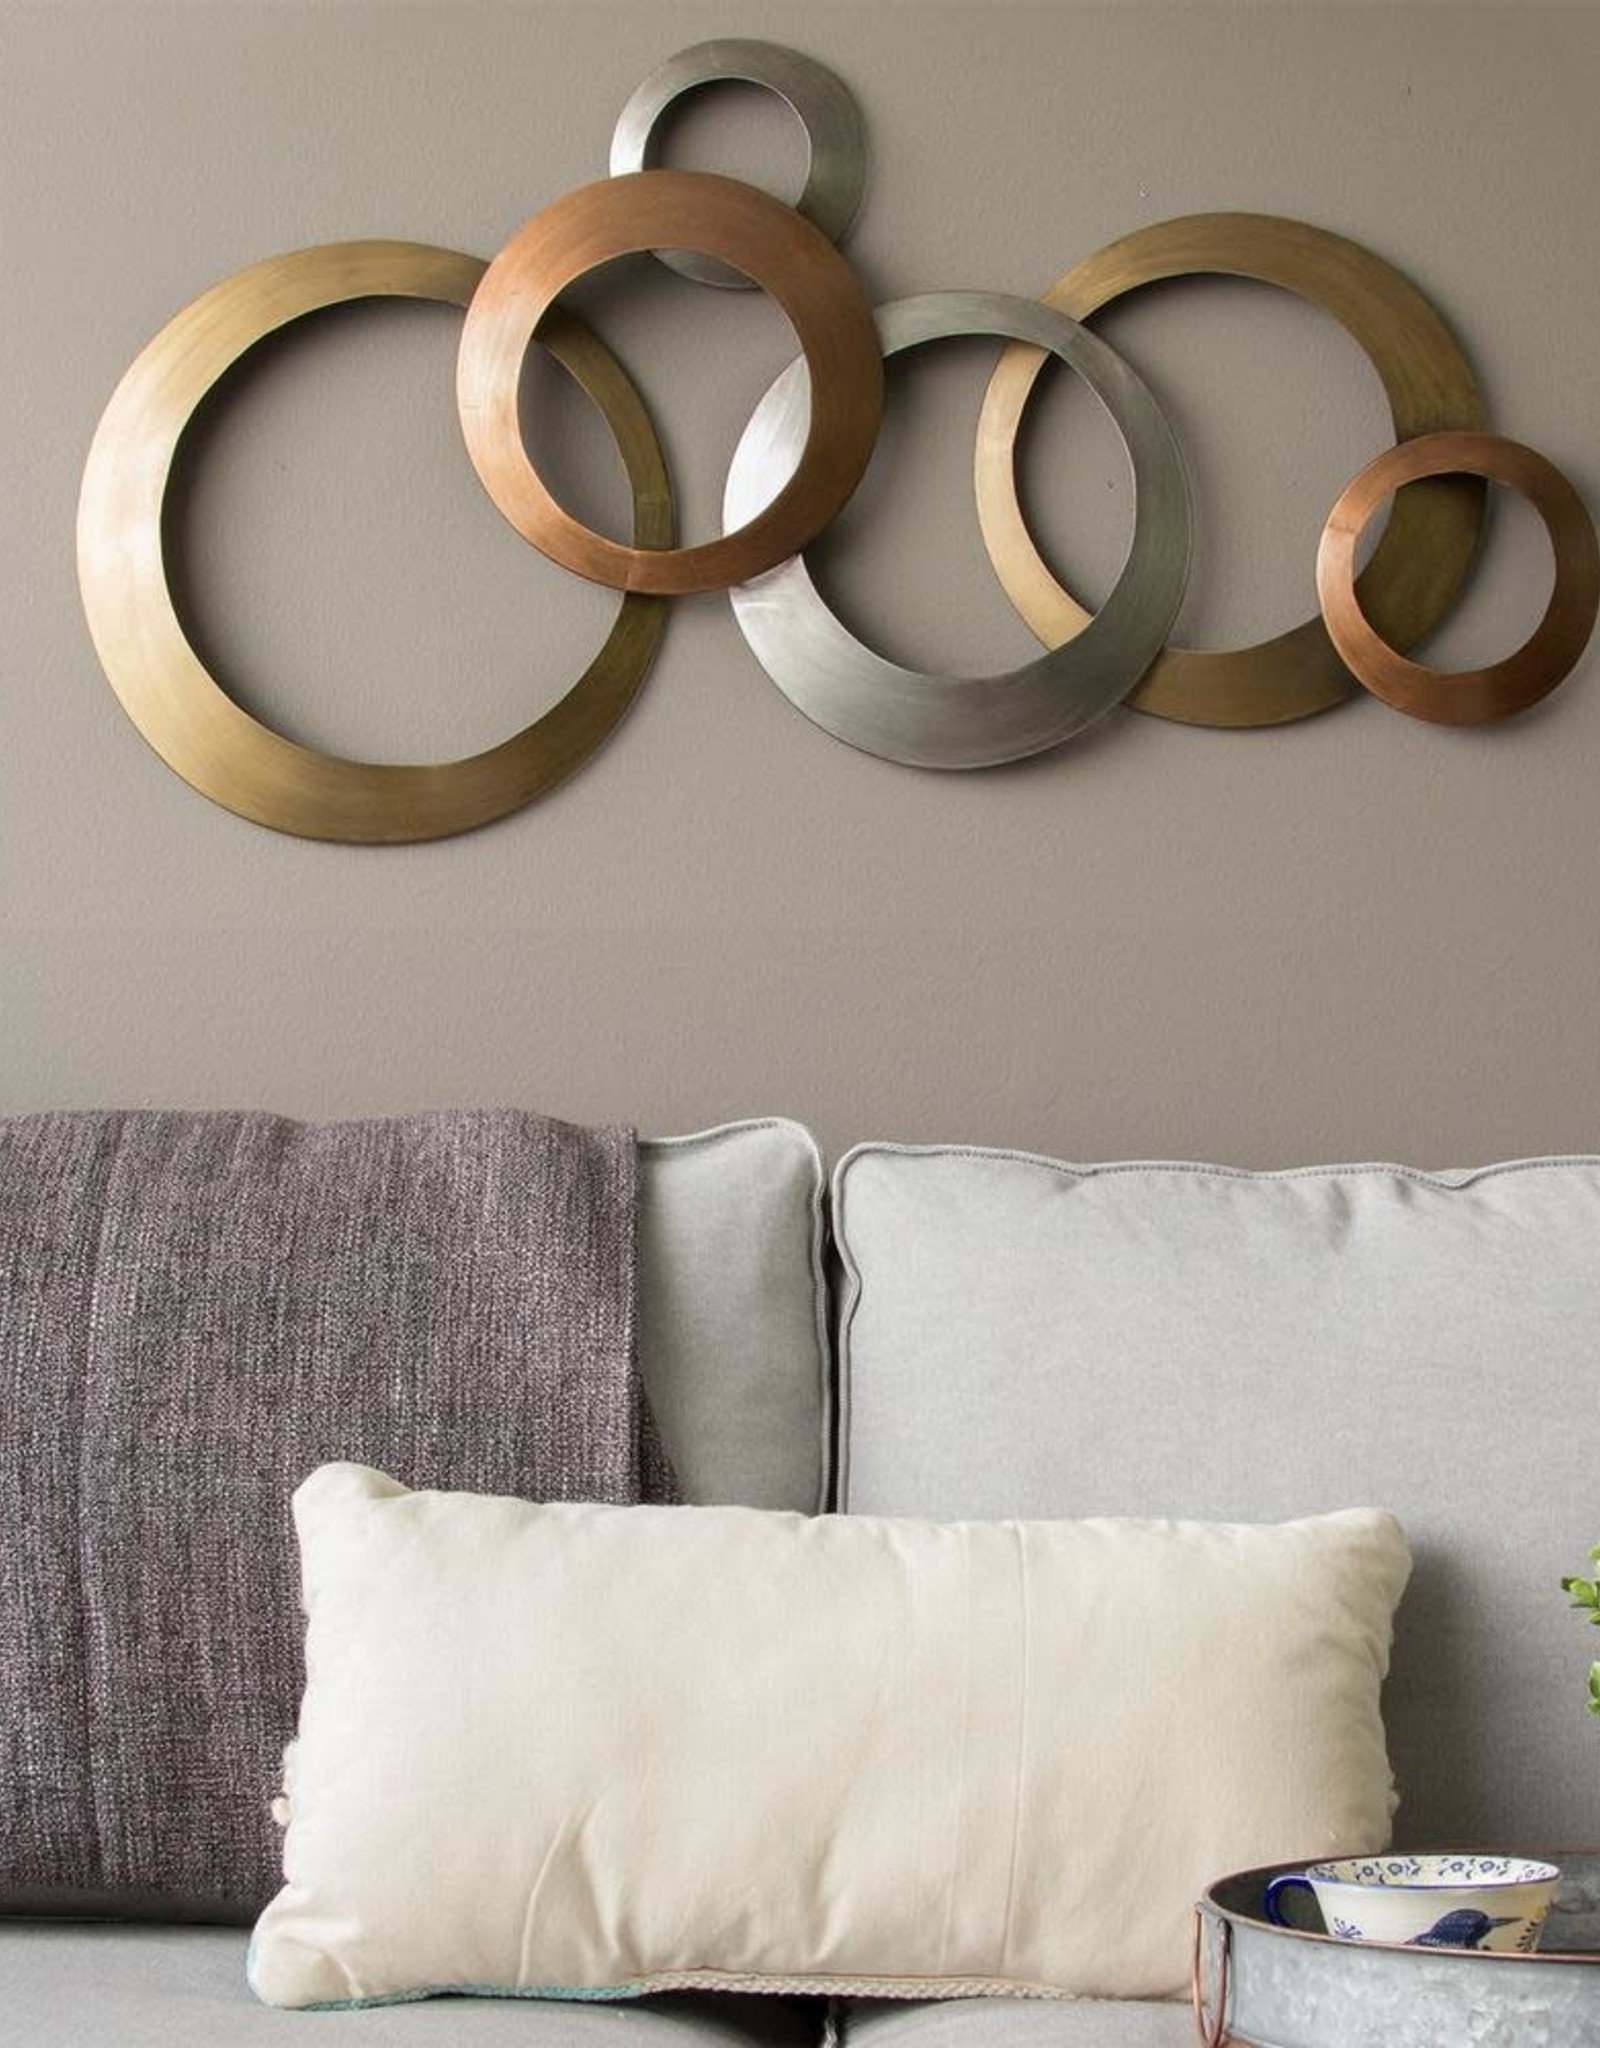 Stratton Home Decor Multi Metallic Rings Metal Wall Decor